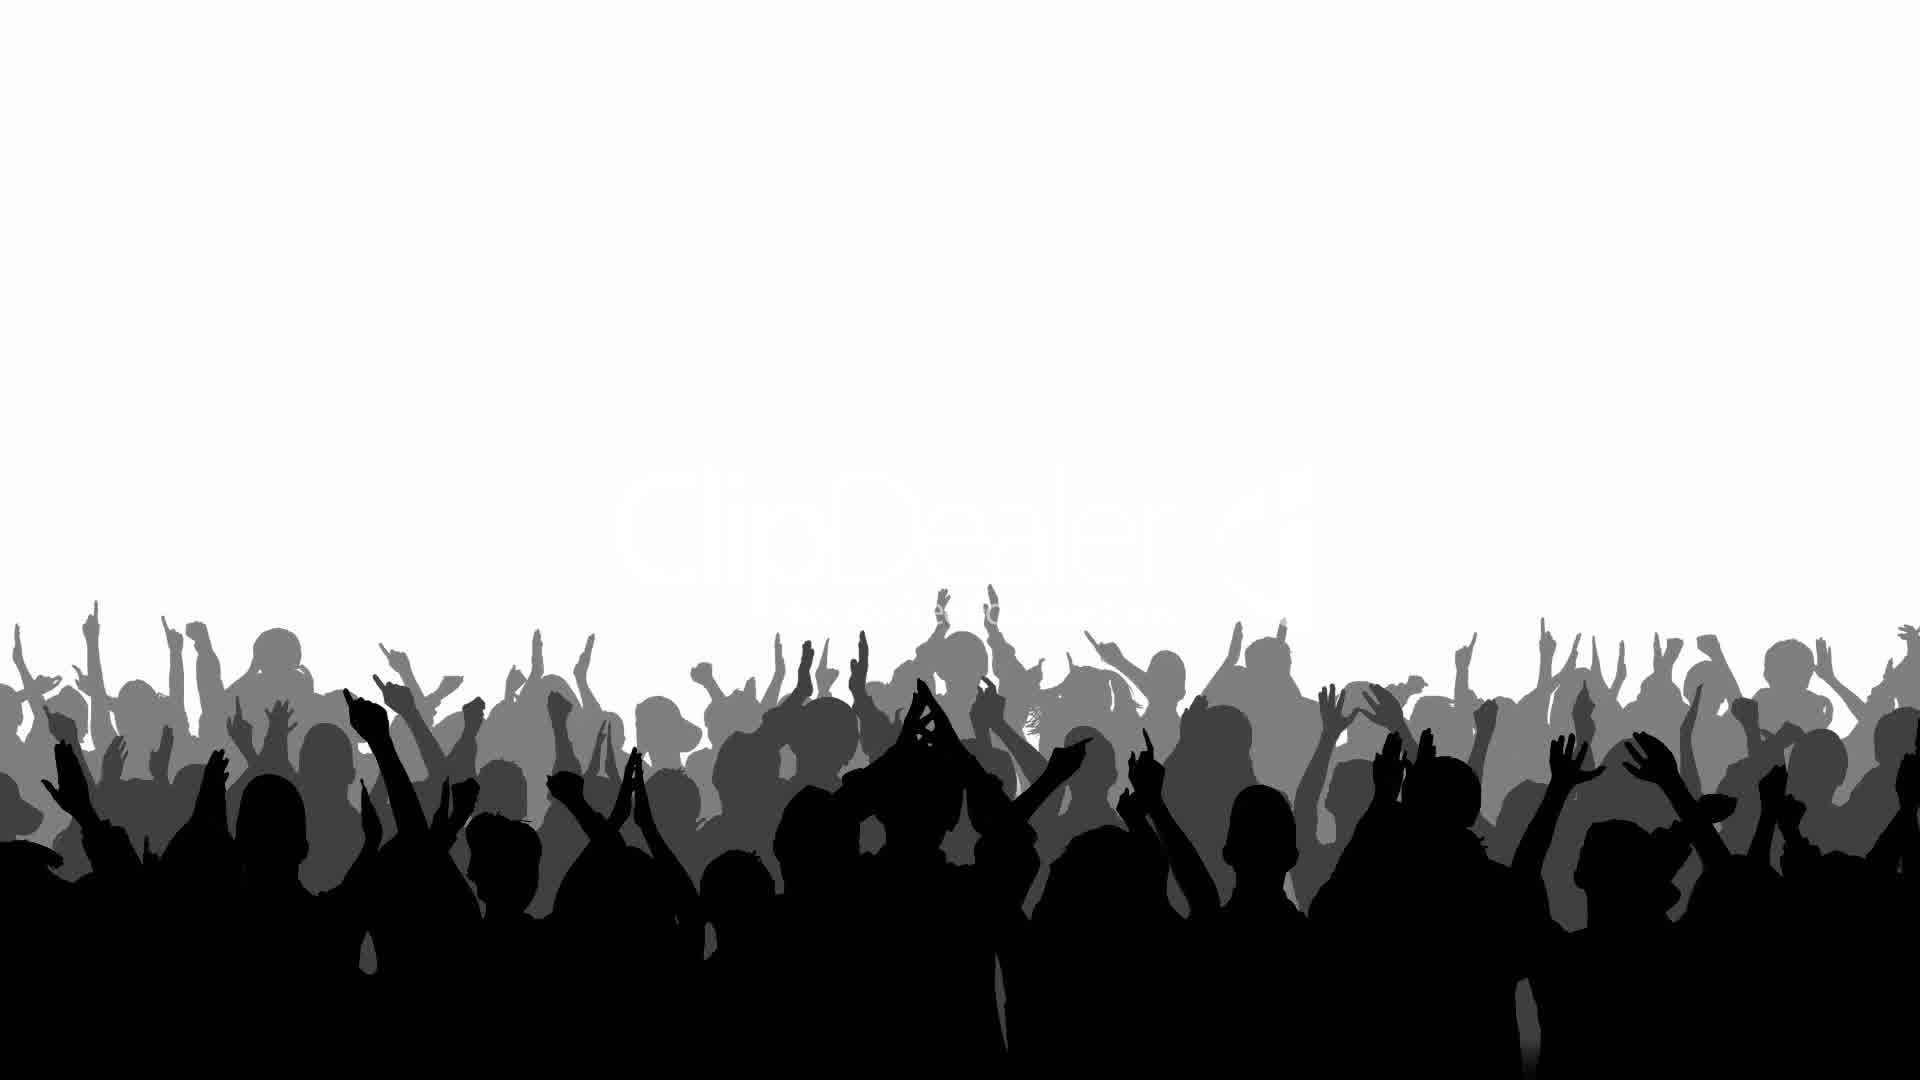 Transparent silhouette crowd stock photos  Shutterstock